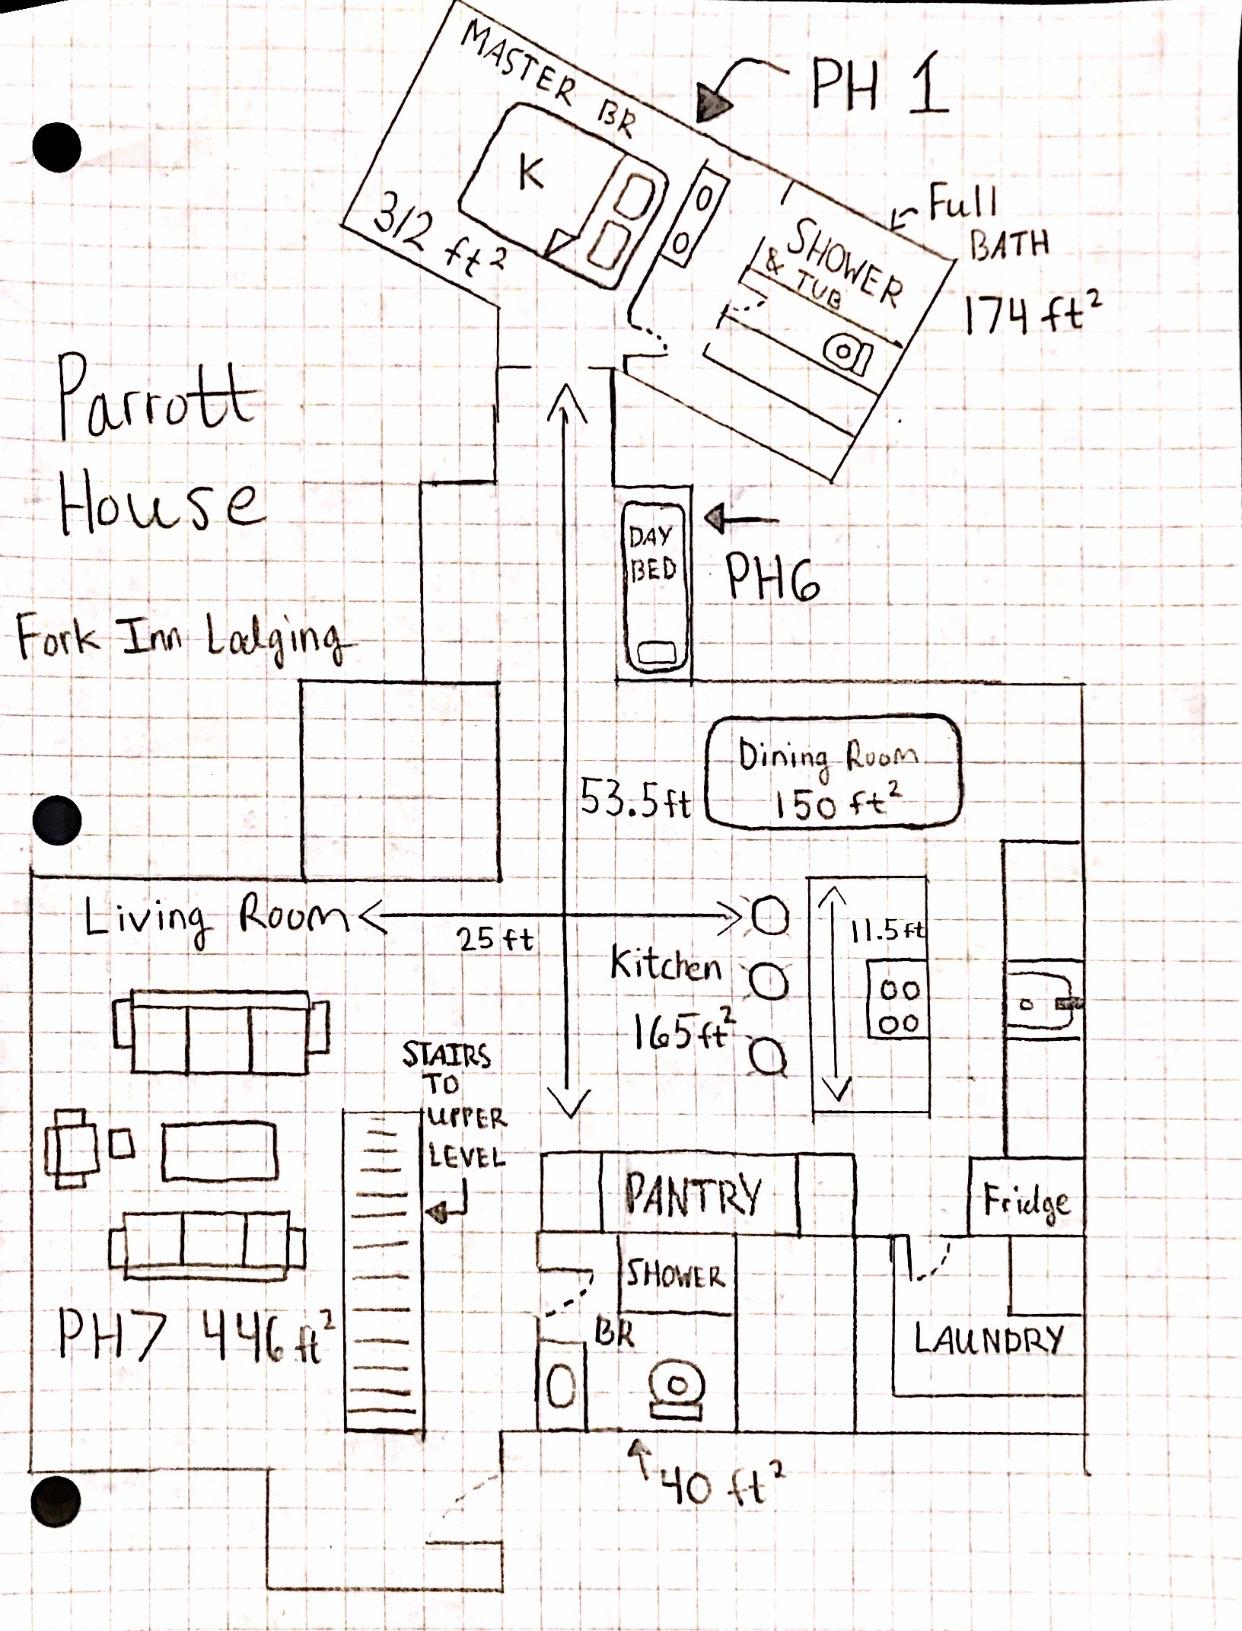 Parrot main floorplans copy.JPG